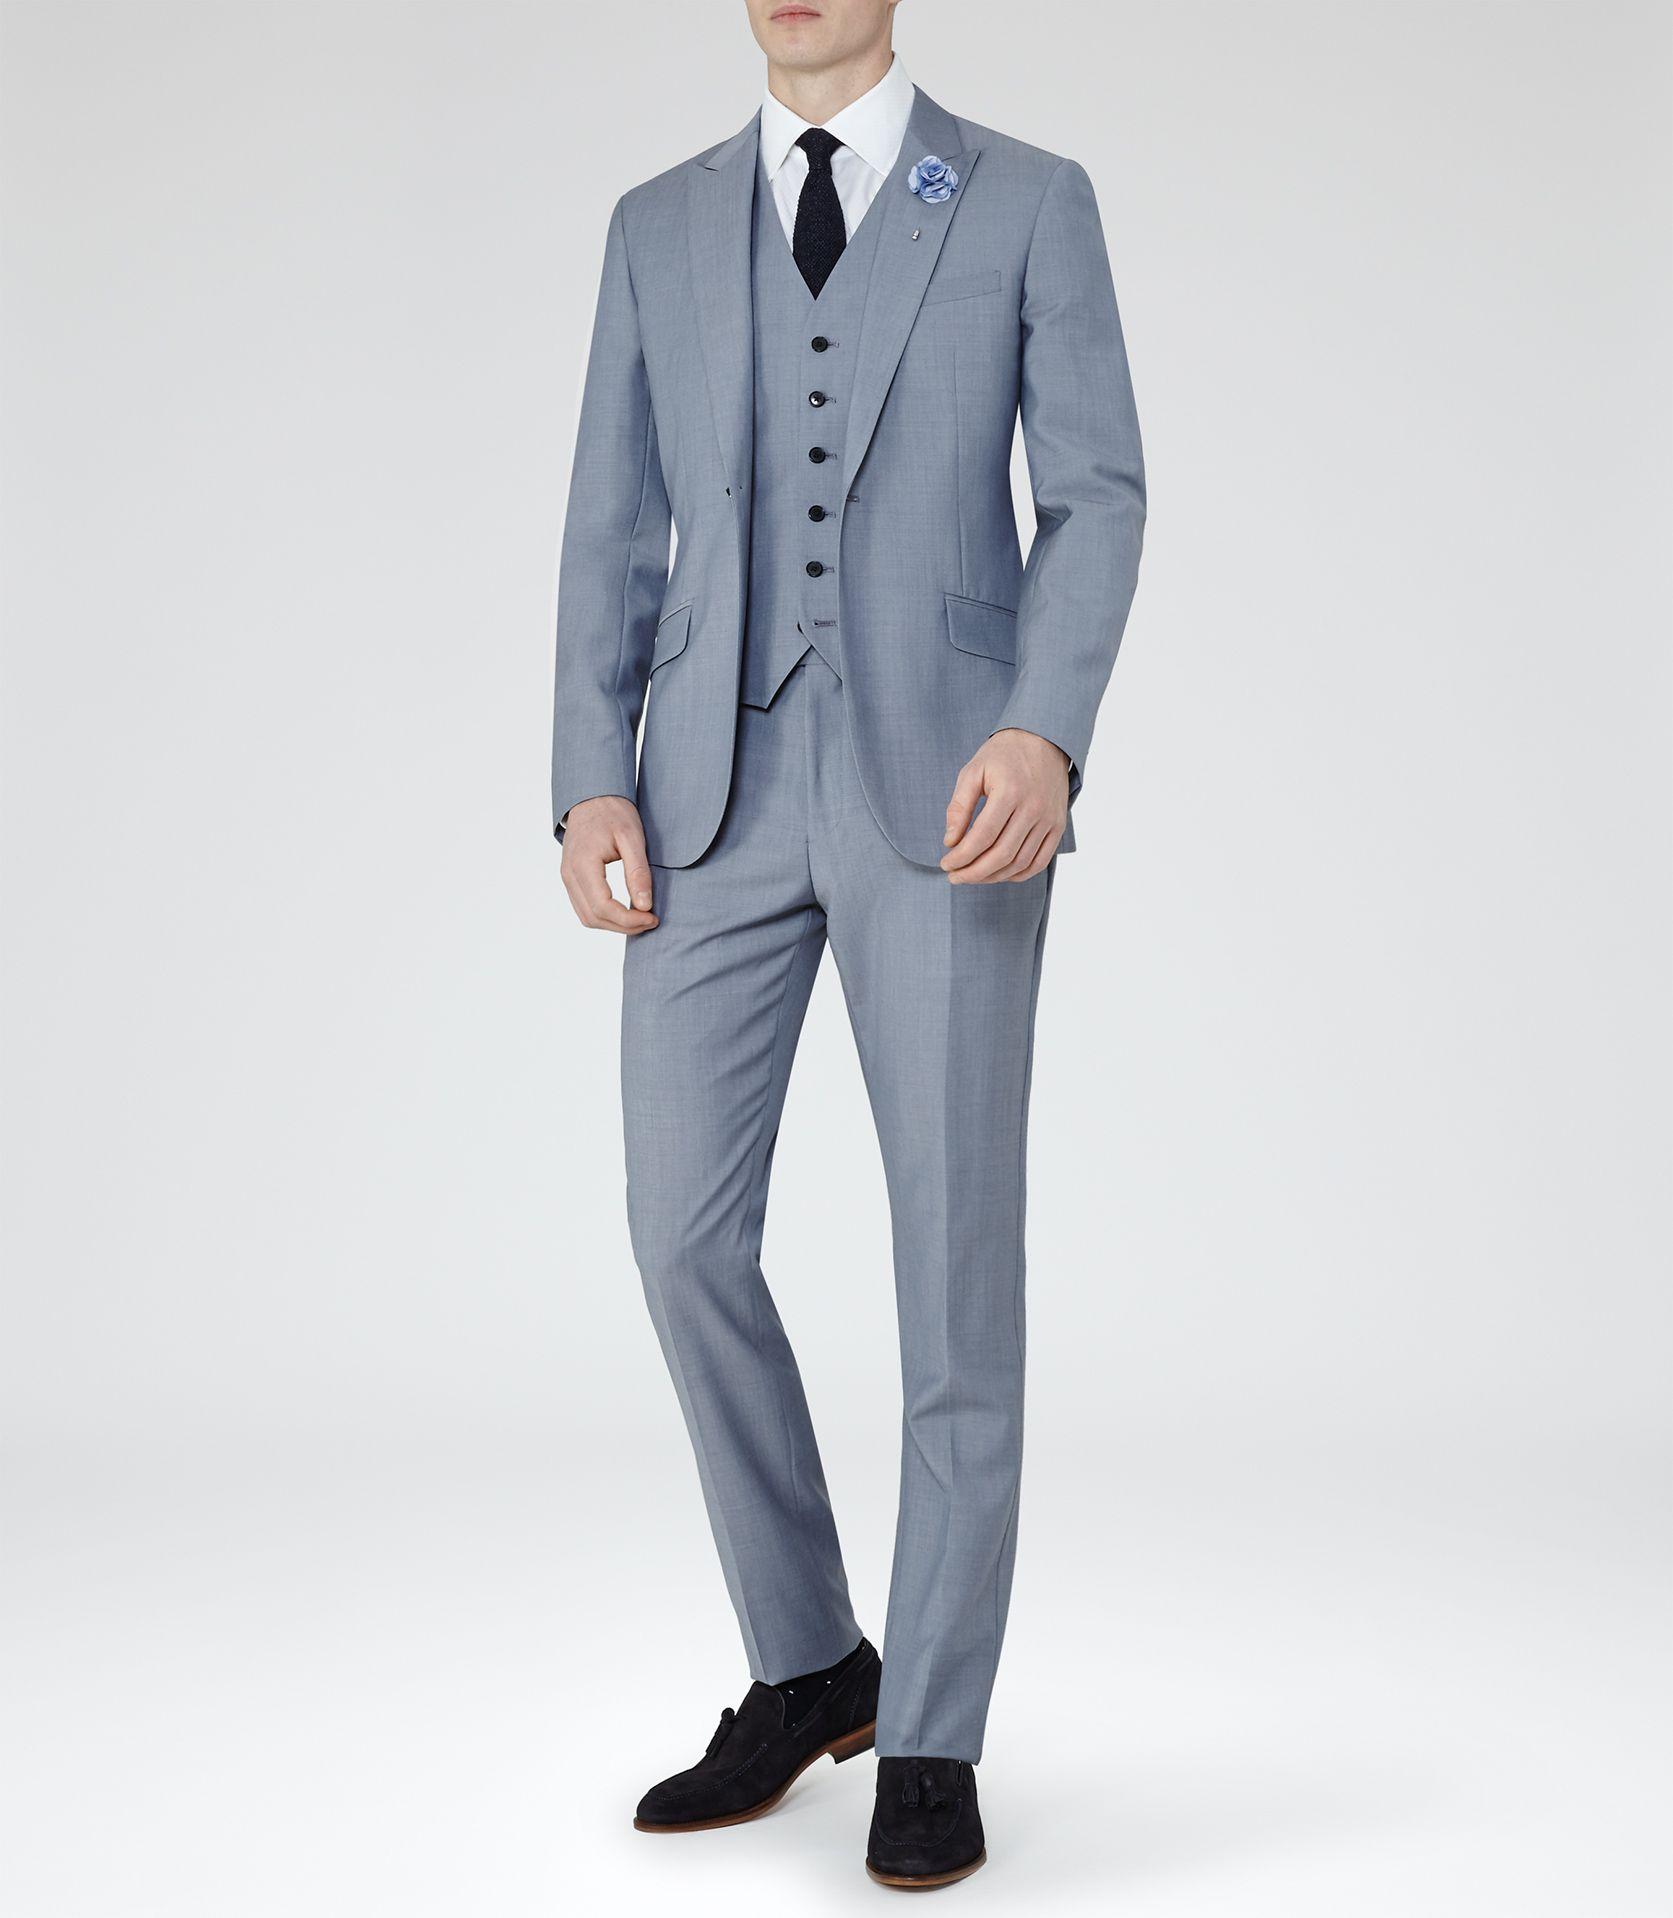 Mens Light Blue Peak Lapel Suit Reiss Milan Mens